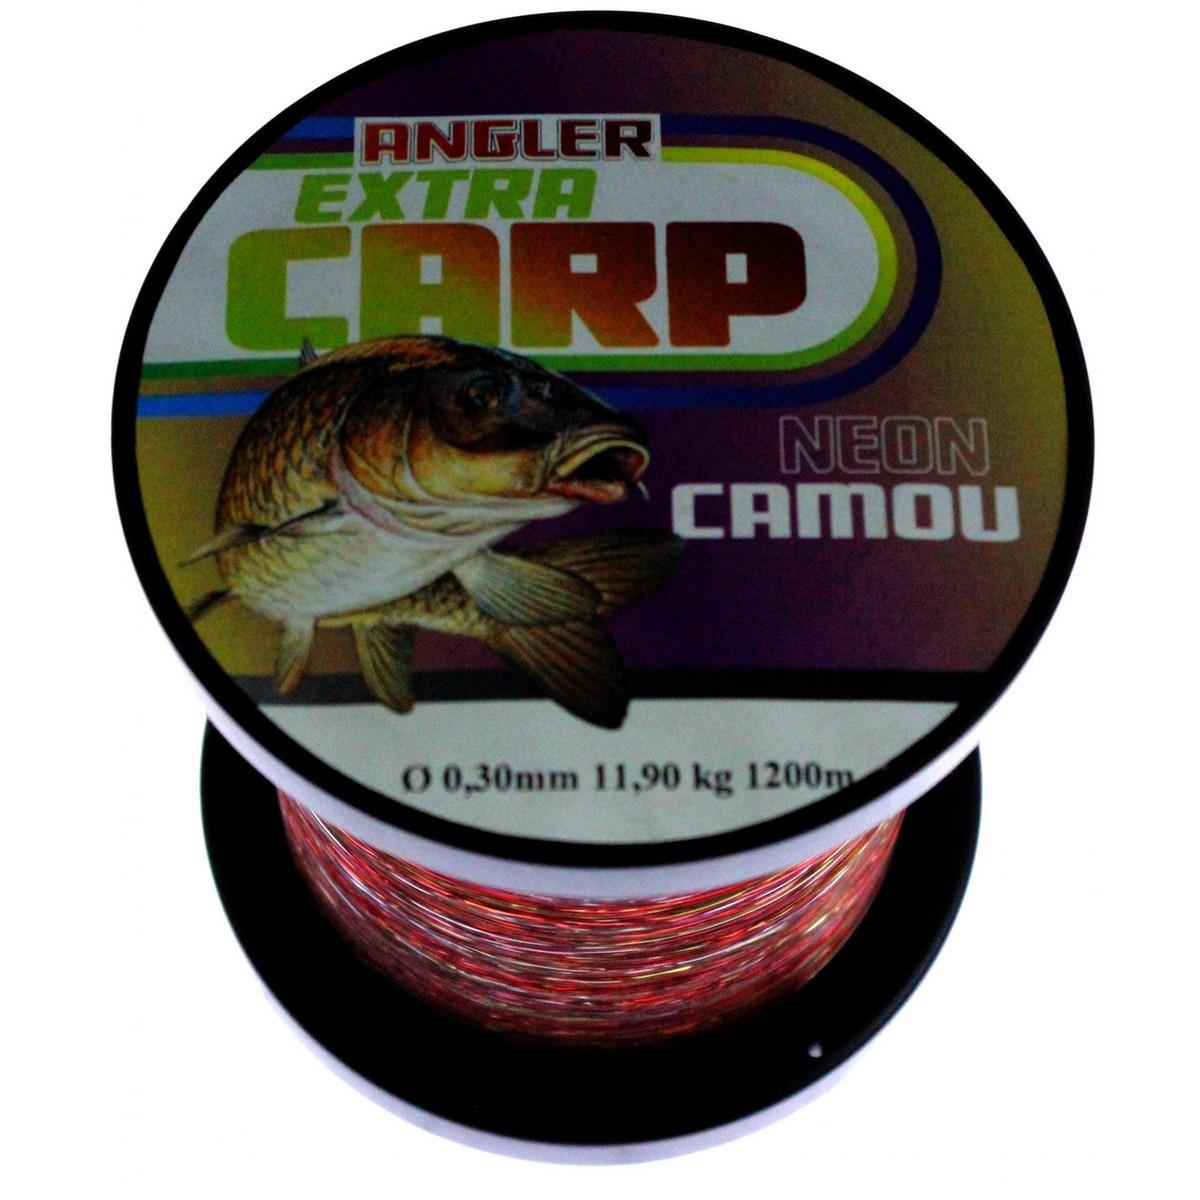 Extra Carp Neorn Camou